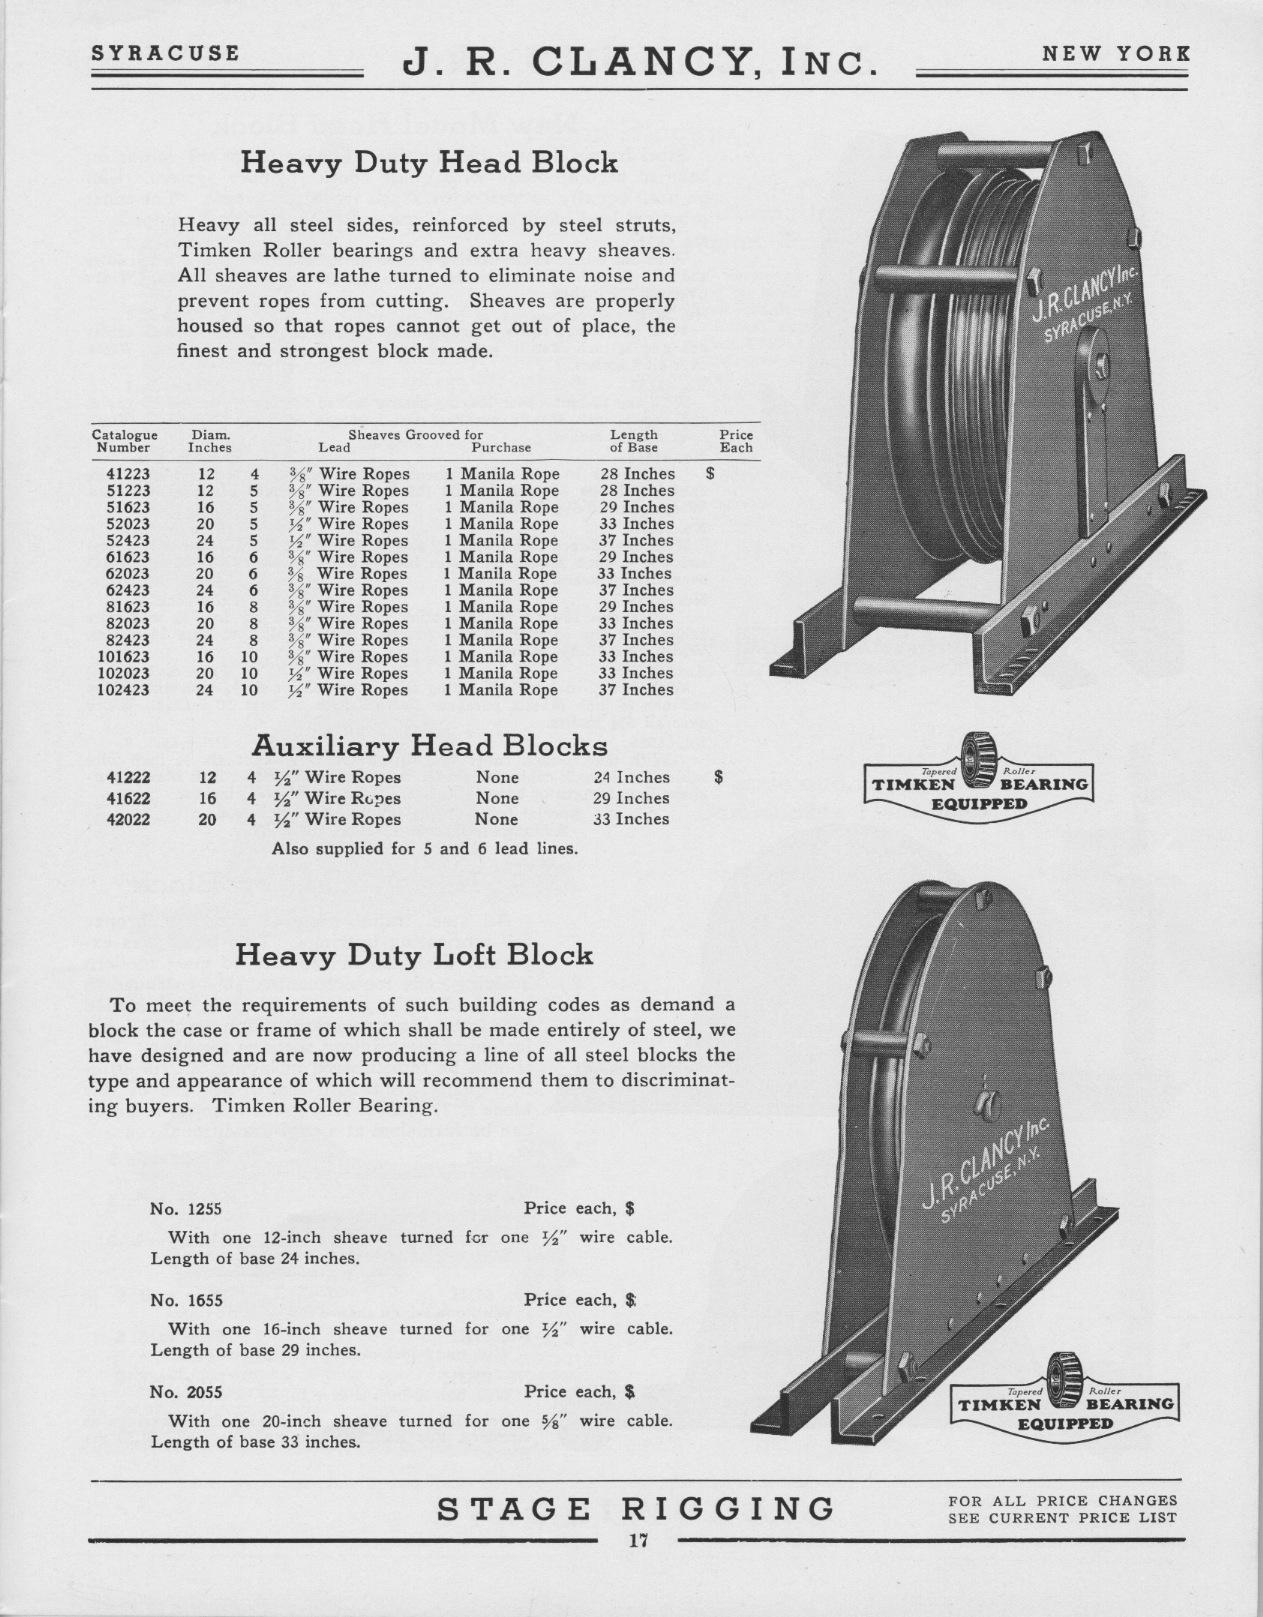 jrclancyarchive.usitt.org - /c51 1956/